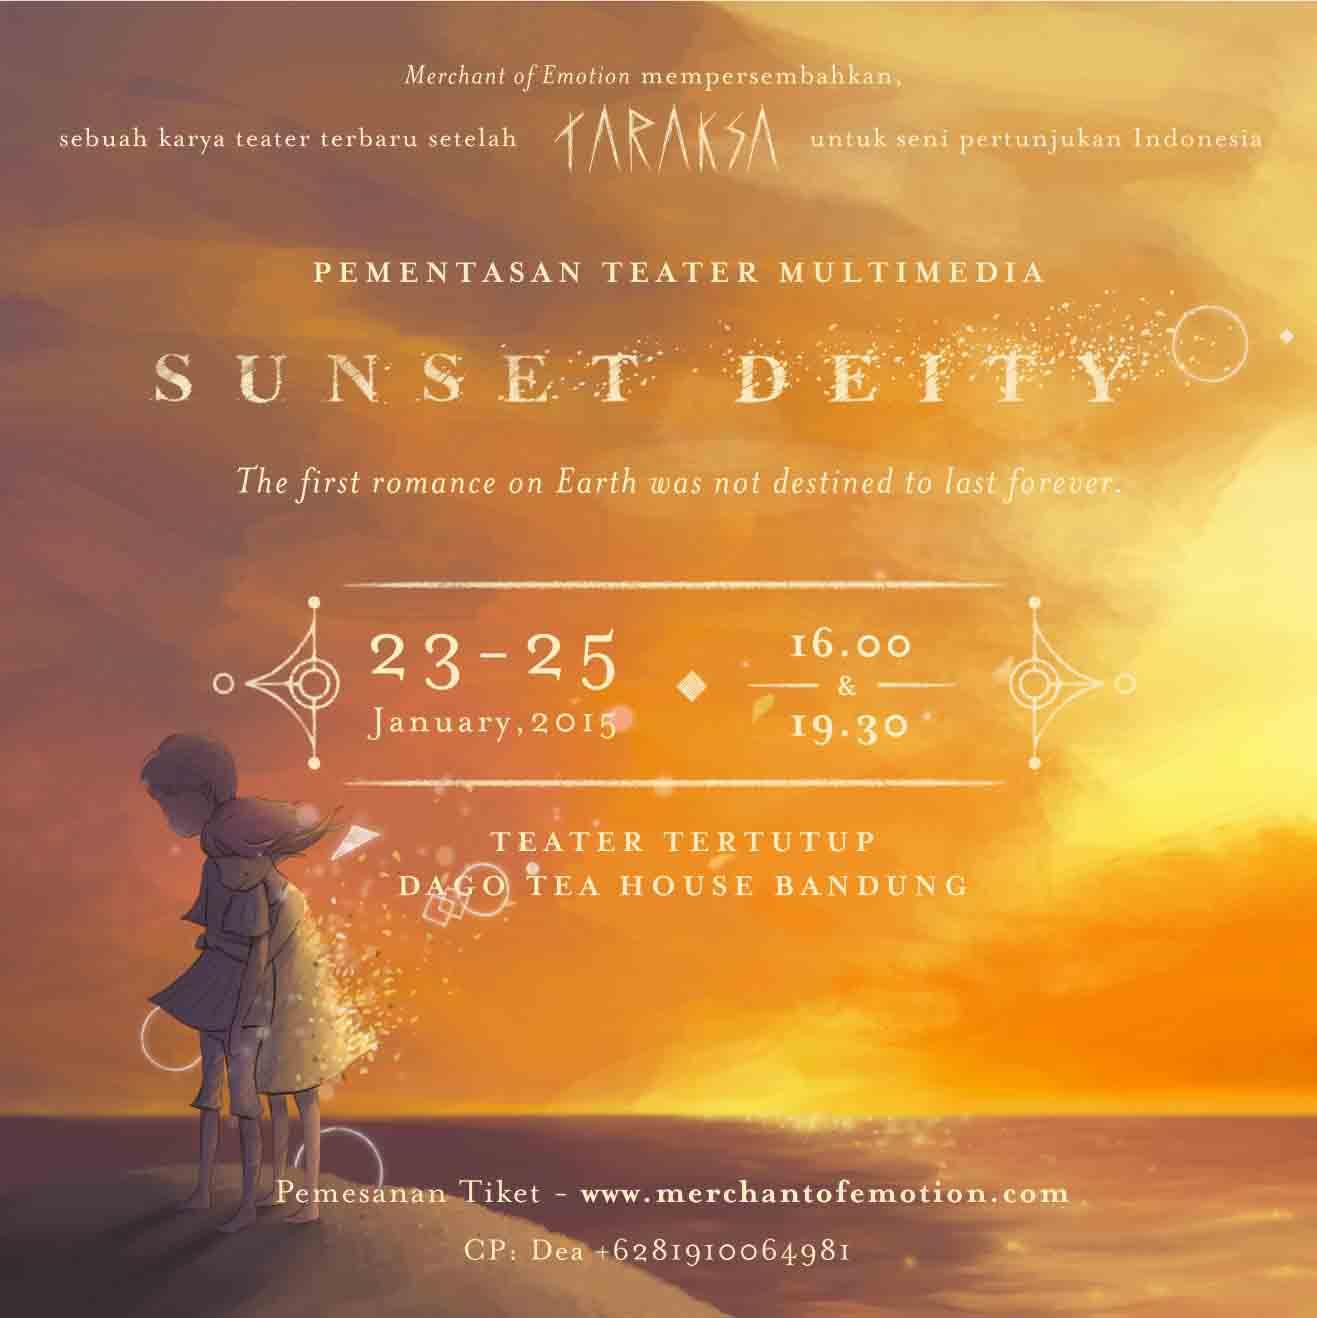 Press Release – Pementasan Teater Multimedia Sunset Deity